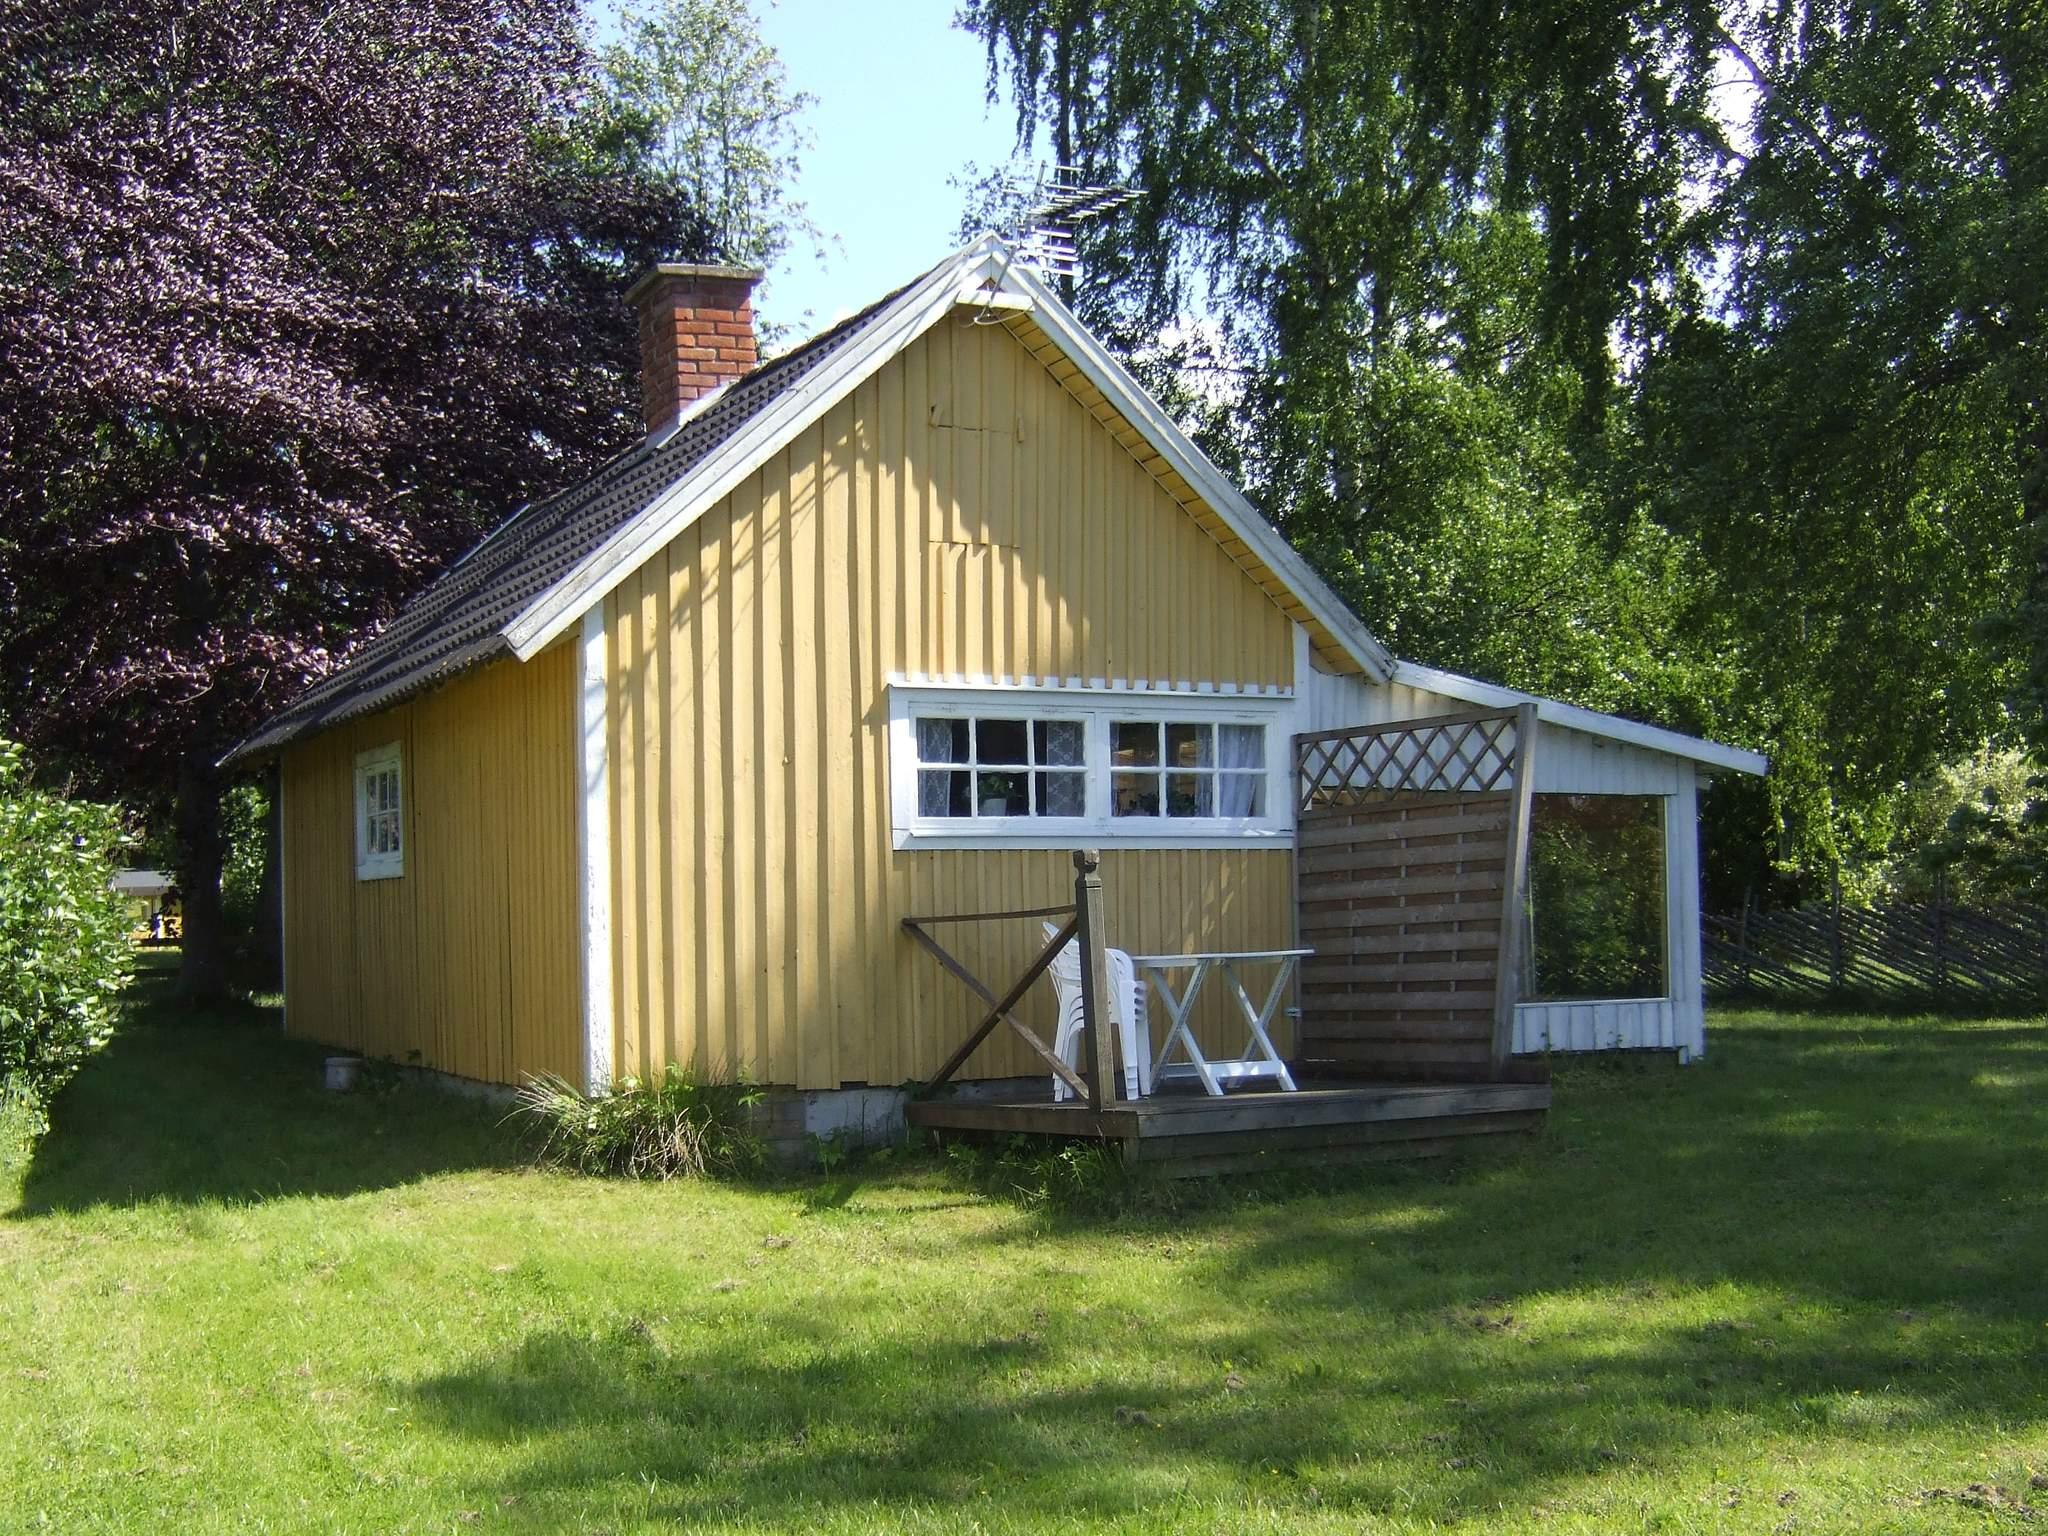 Ferienhaus Melldala (82014), Lerdala, Västra Götaland län, Westschweden, Schweden, Bild 7